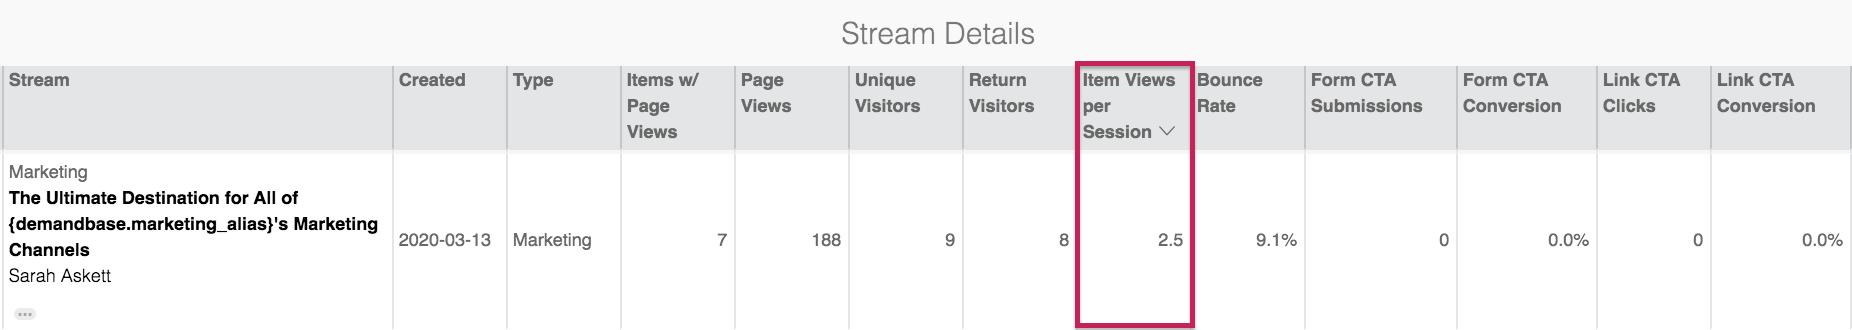 Uberflip Analytics screenshot highlighting number of items consumed per session